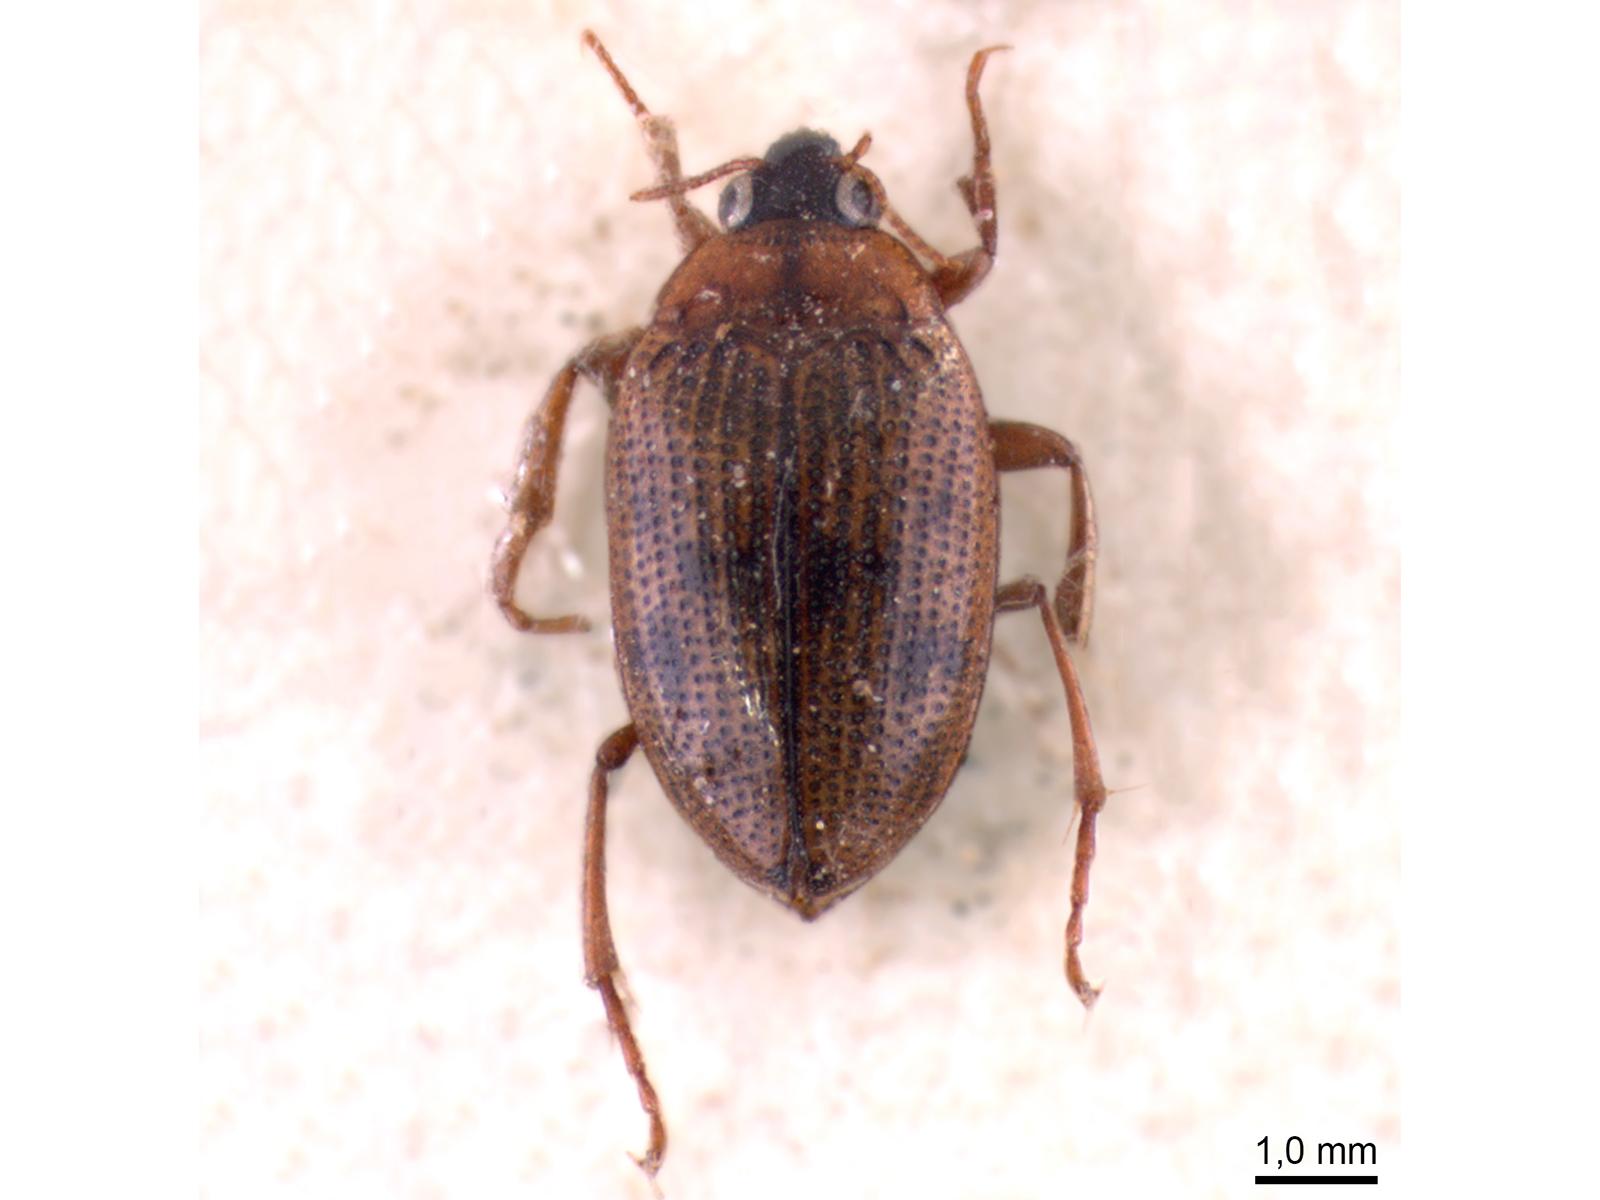 Haliplus lineatocollis (Marsham, 1802)